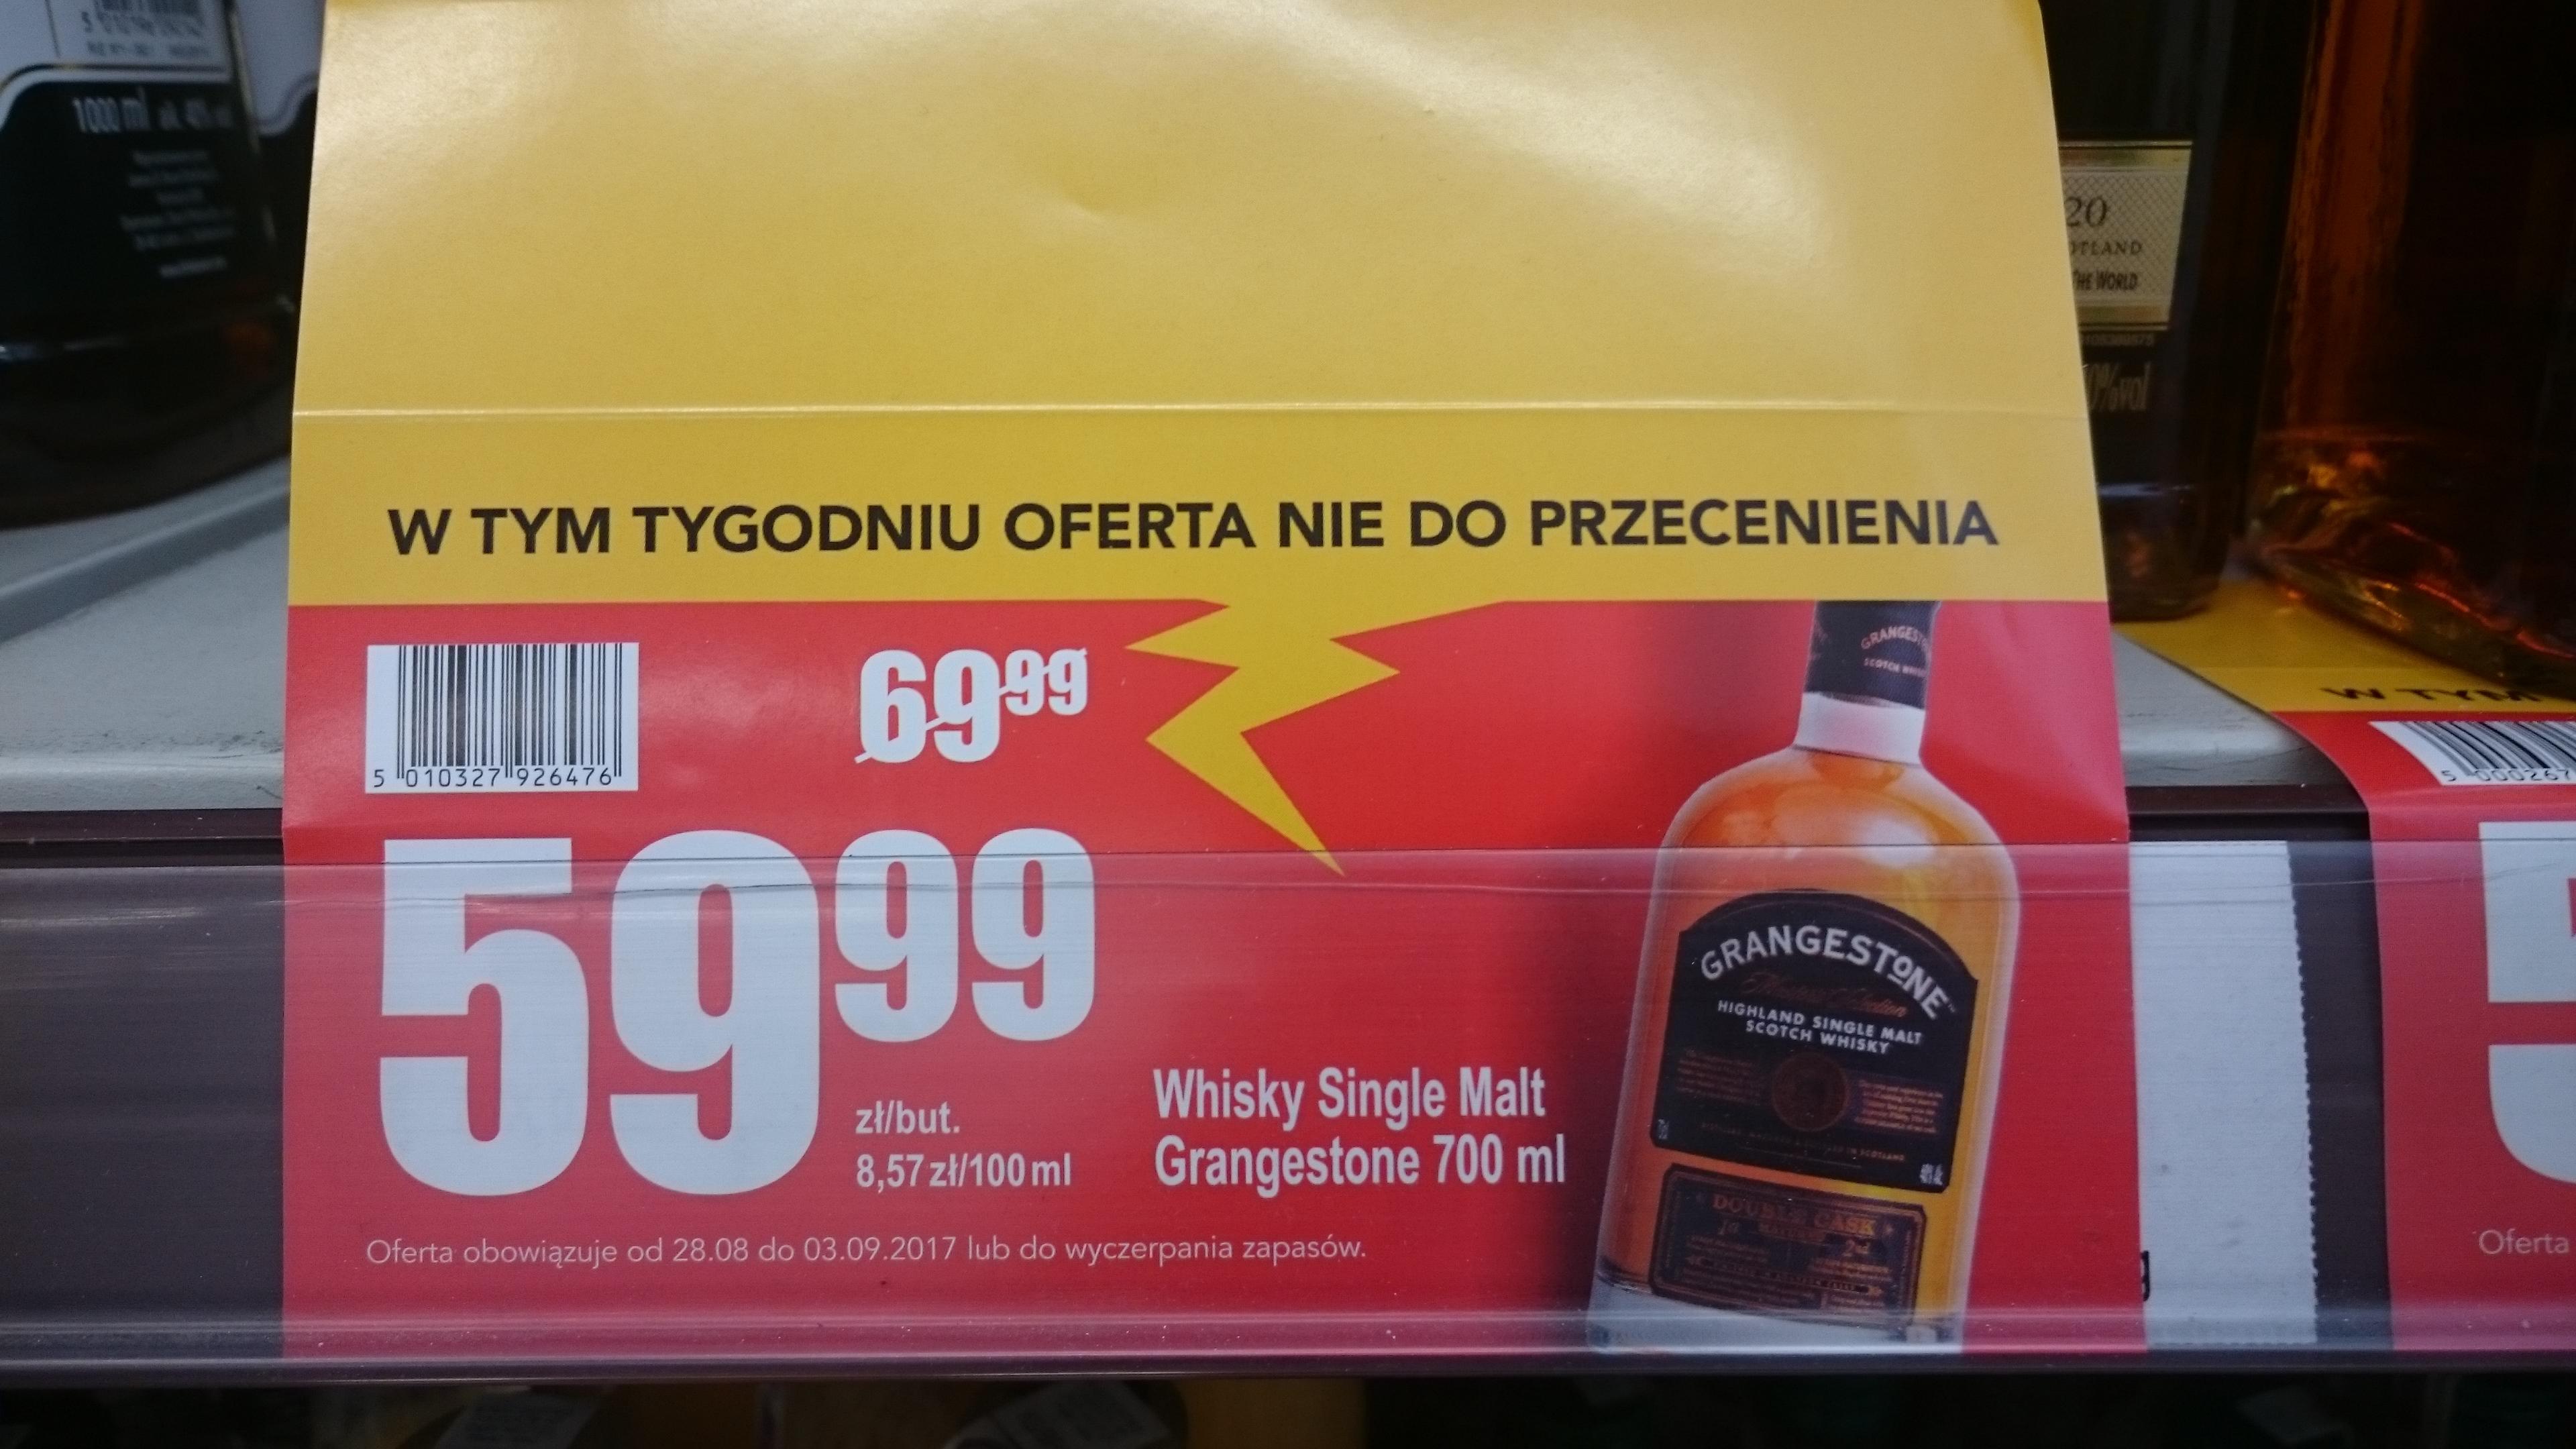 whisky single malt grangestone najtańszy single malt na rynku